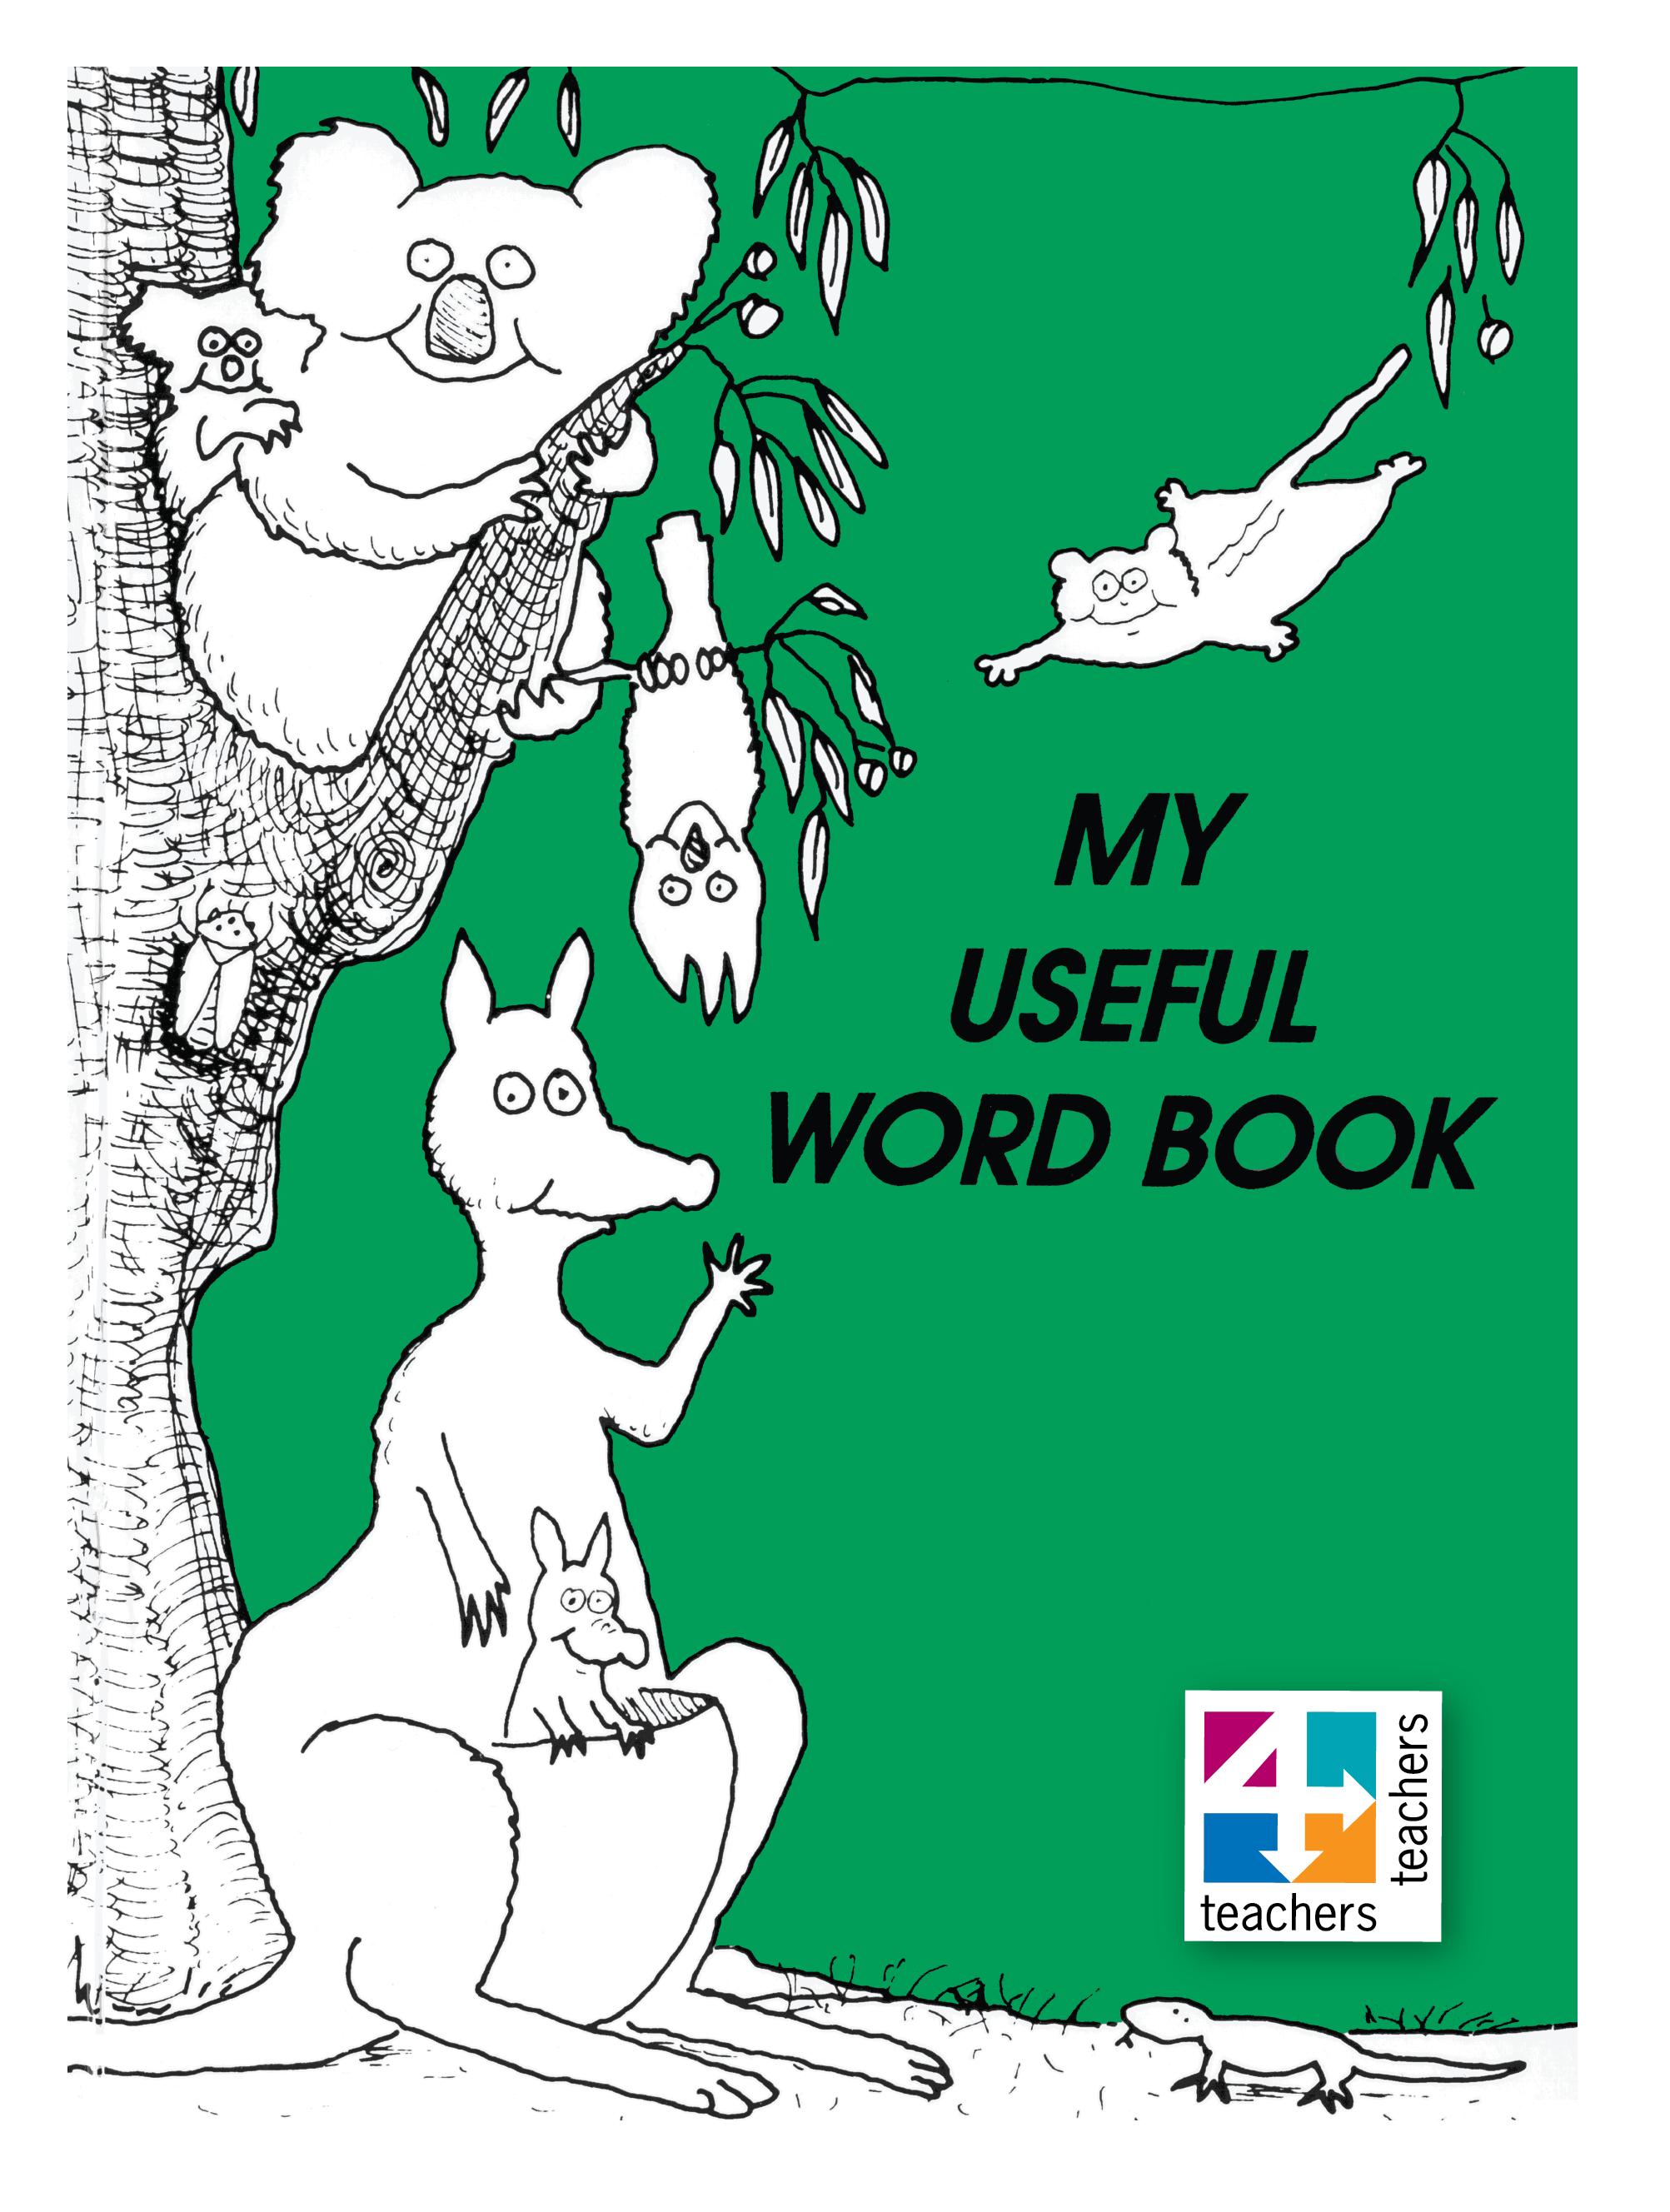 usefulbooks-01.png